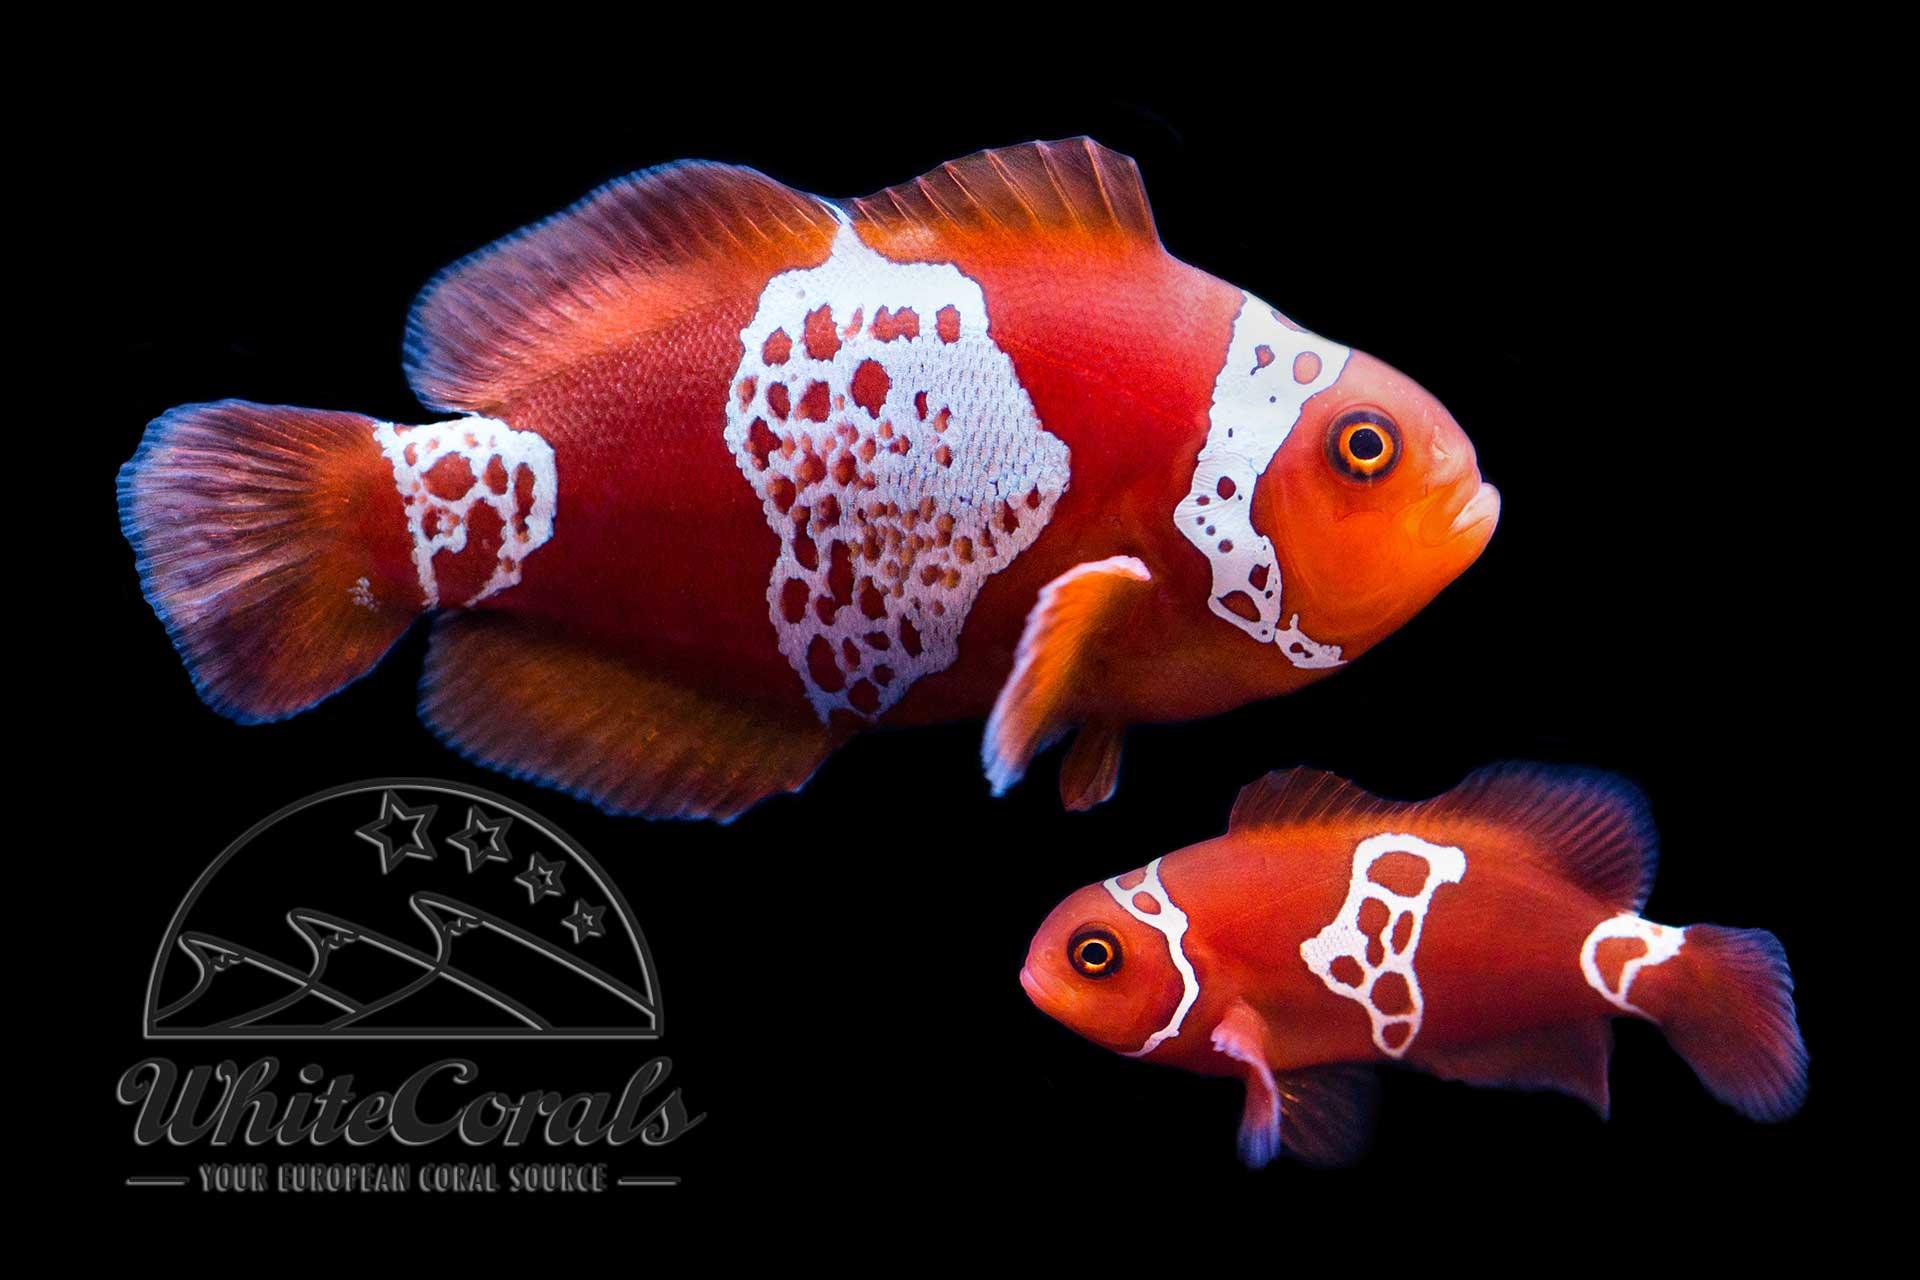 Premnas biaculeatus - Lightning Maroon Clownfish - Pair